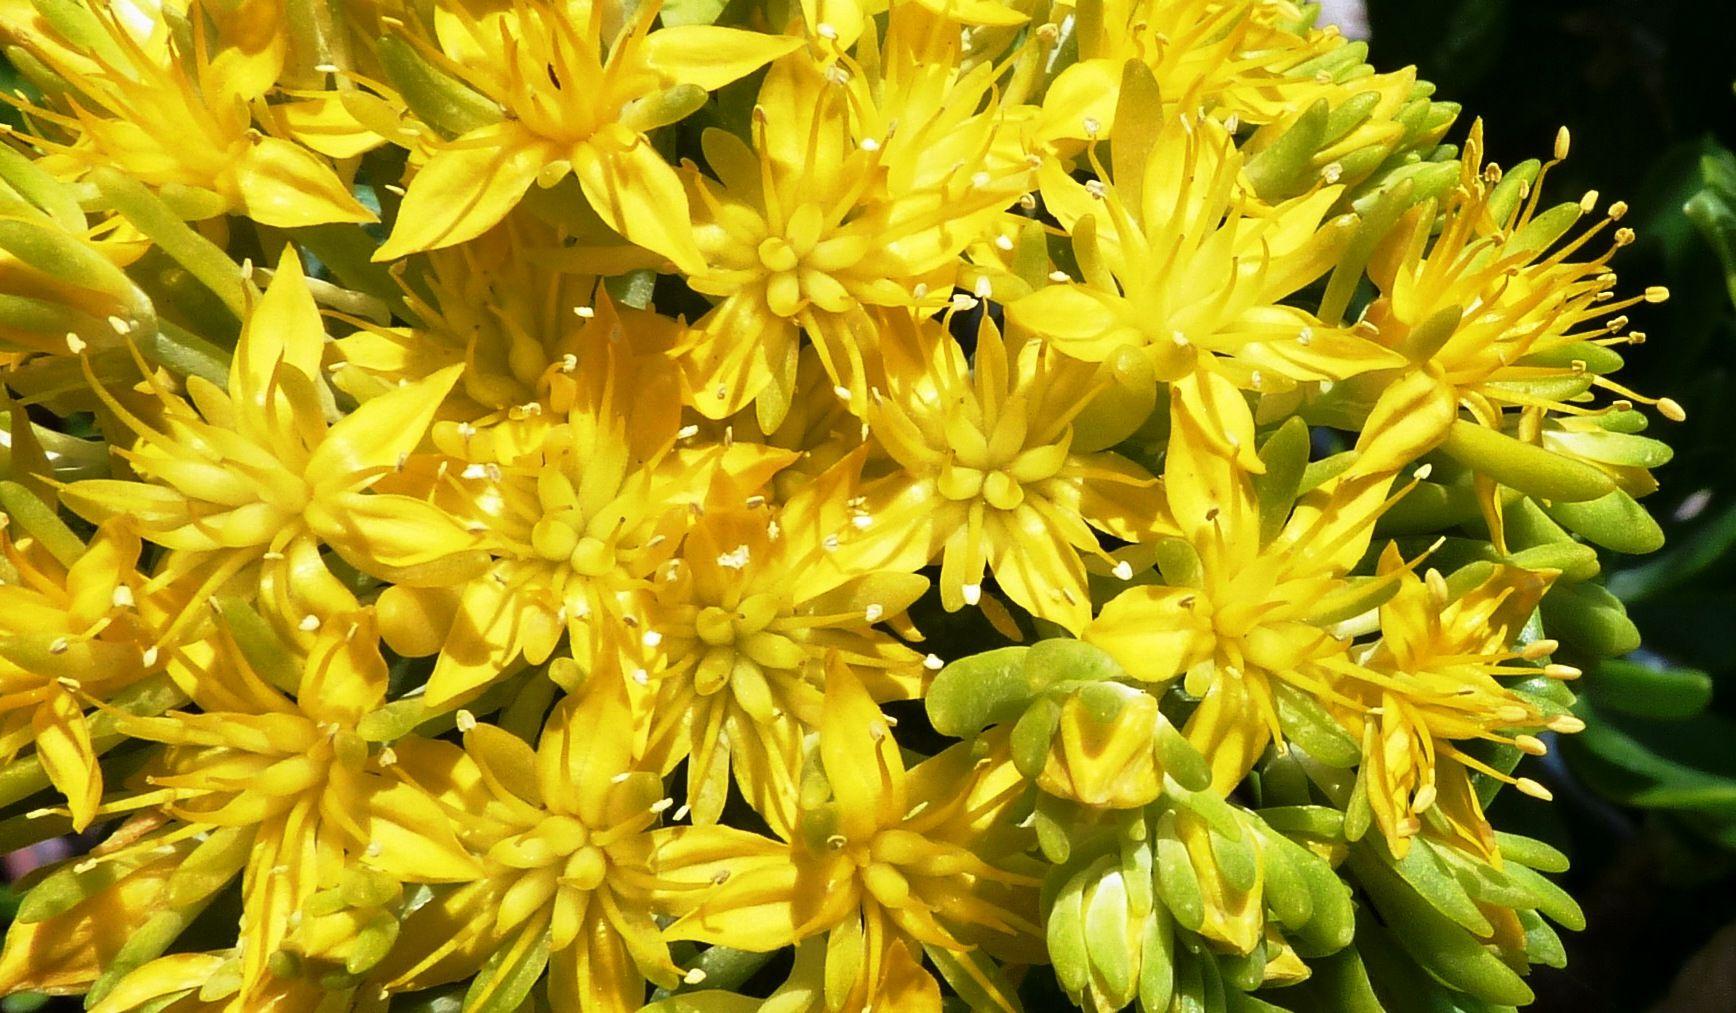 Sedum Torulosum Floraison Juin 2019 Plantes Grasses Plante